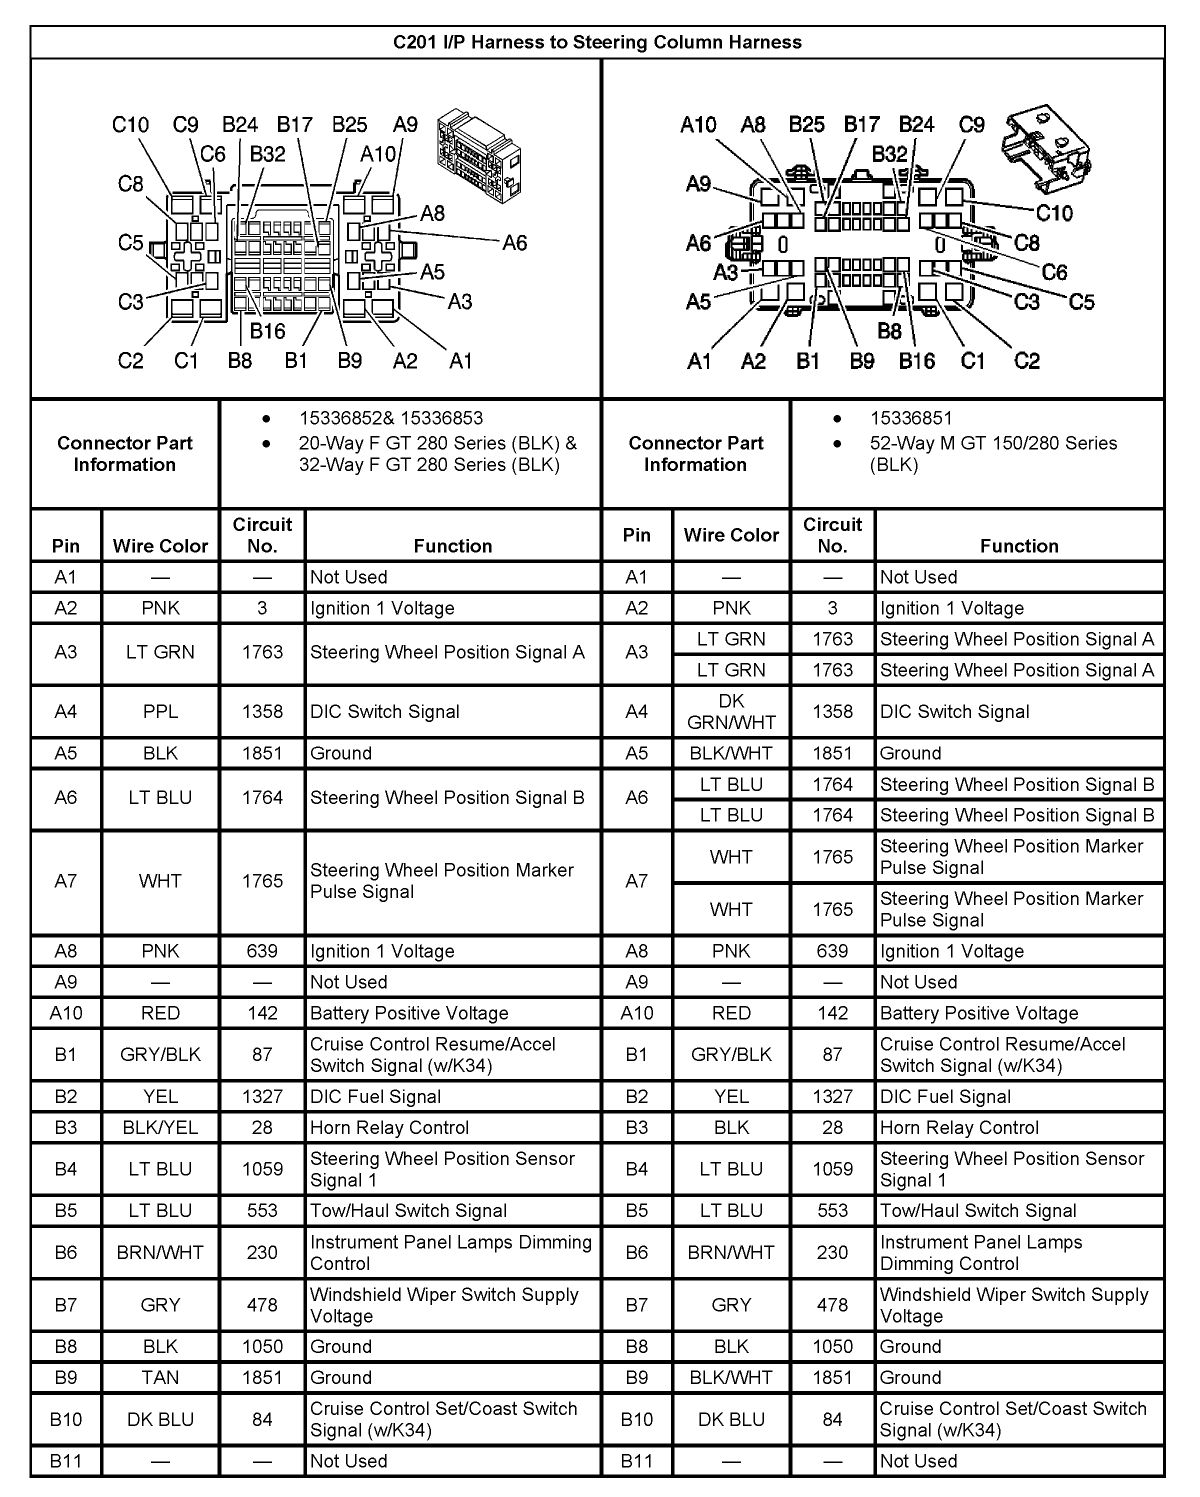 55 Luxury 2004 Gmc Yukon Bose Radio Wiring Diagram Gmc Yukon 2004 Chevy Silverado Chevy Trailblazer